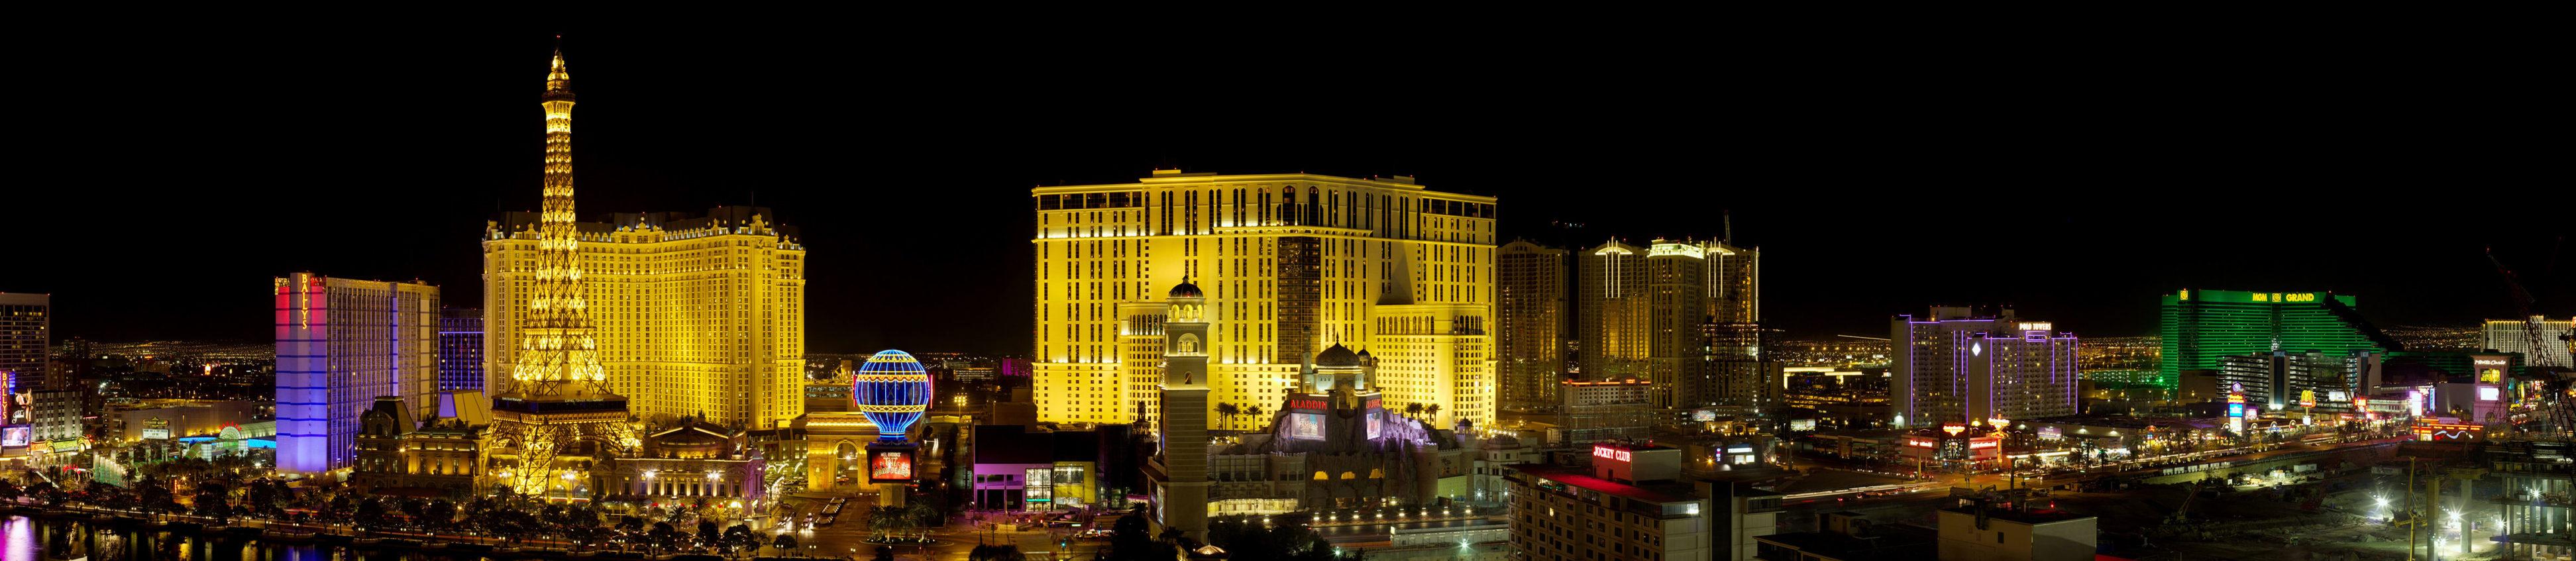 Las Vegas Walk-in Coolers and Freezers